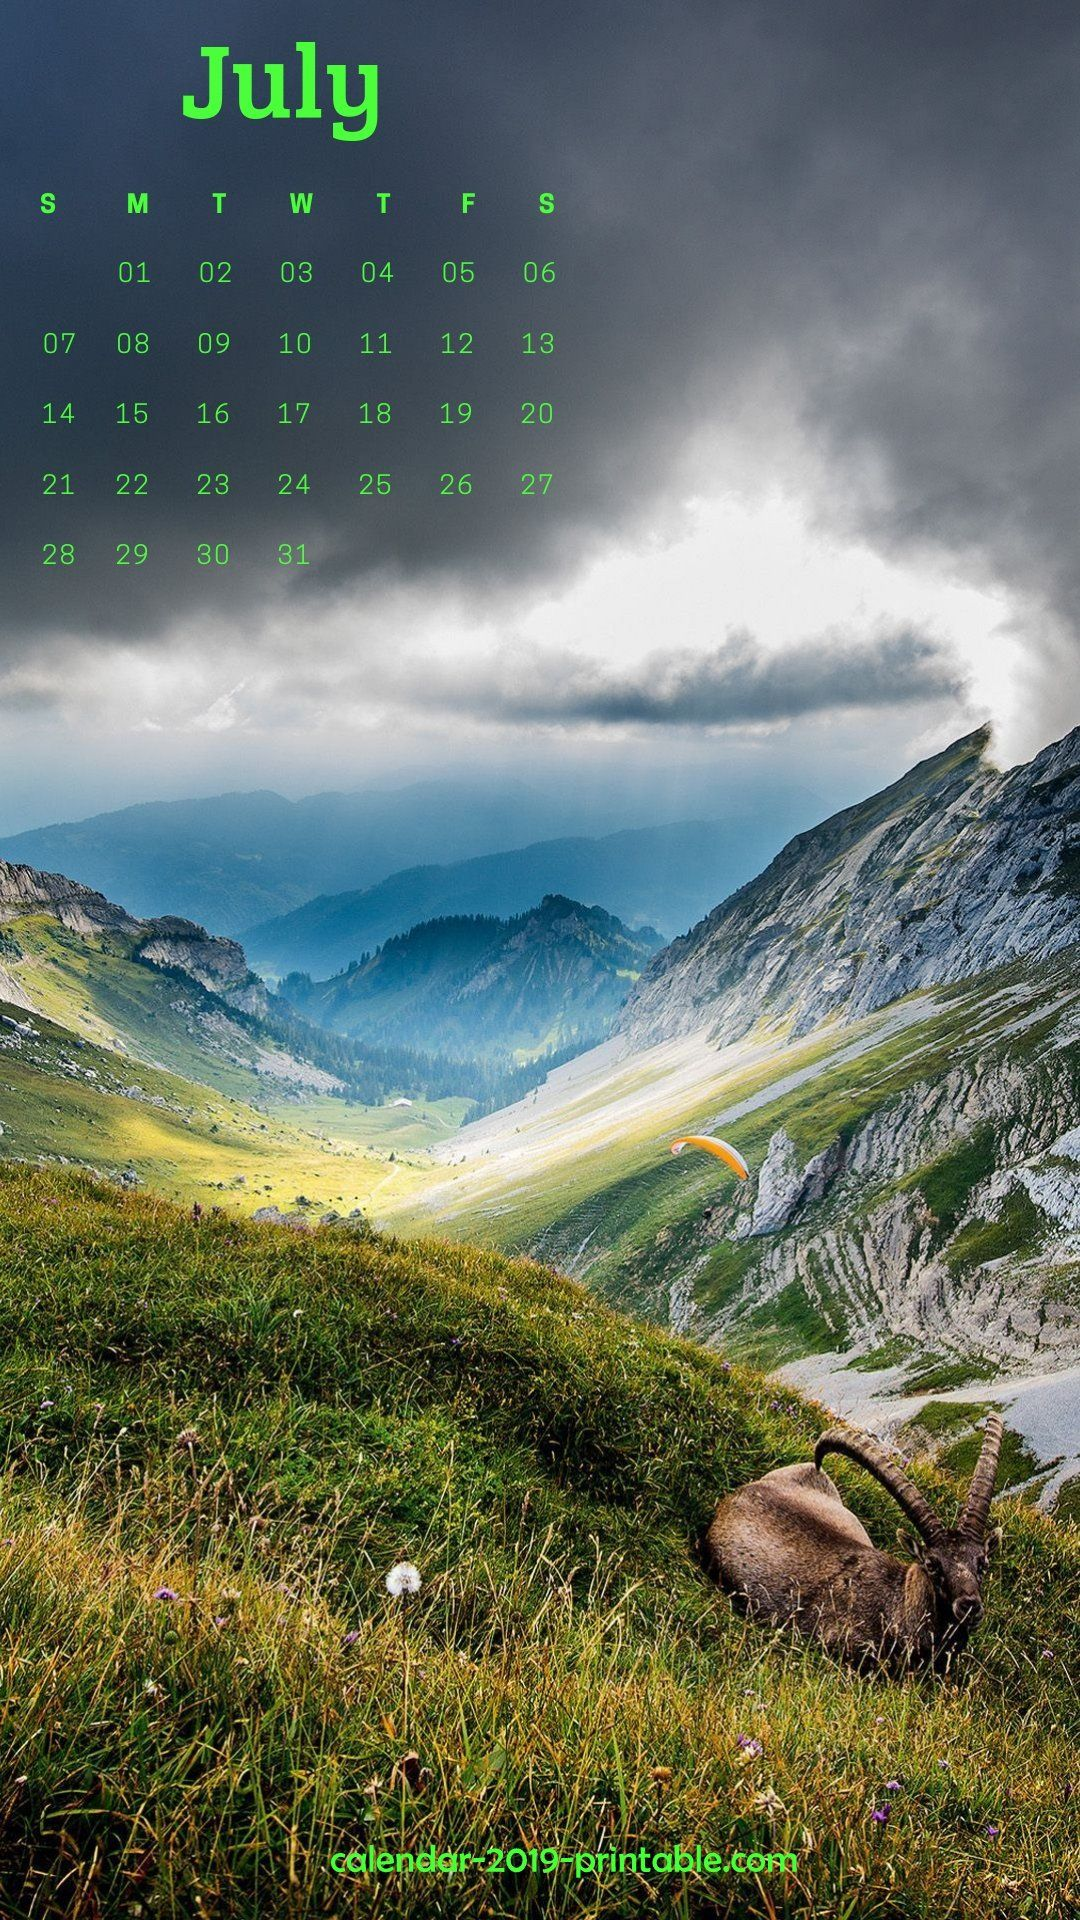 july 2019 iphone calendar nature wallpaper